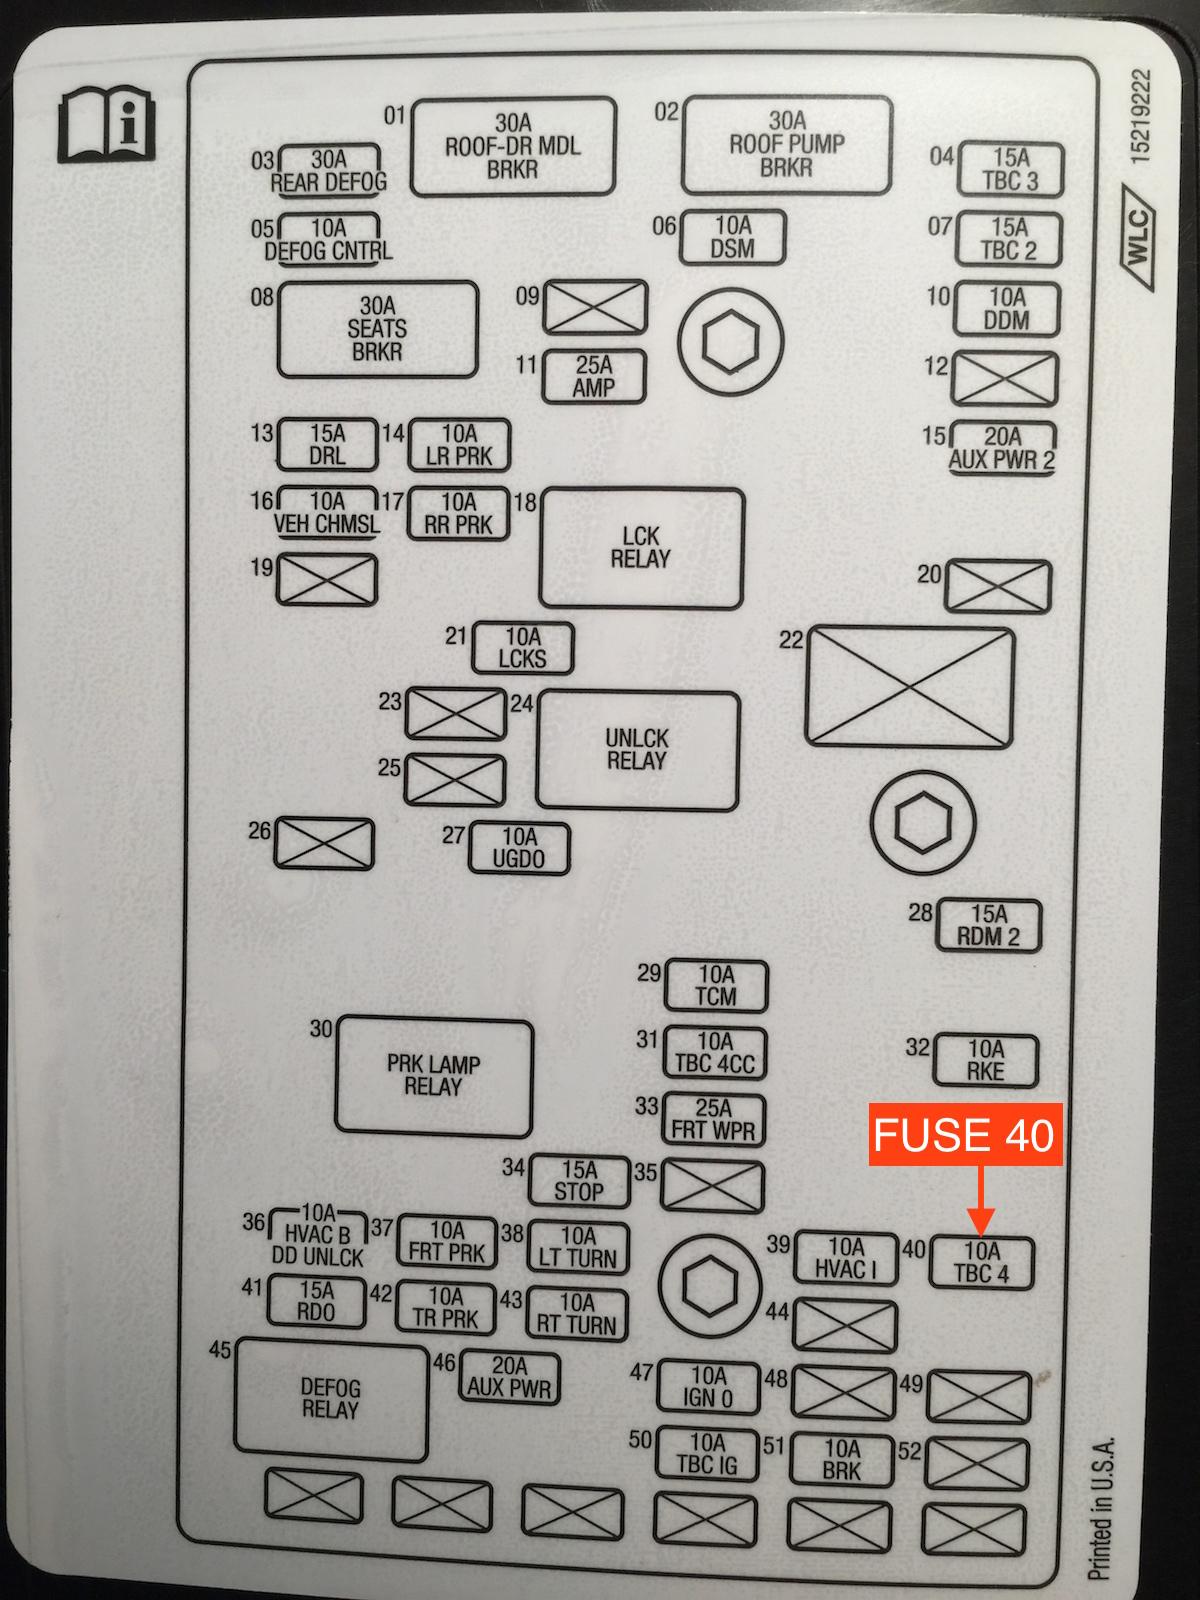 Wiring Diagram 2005 Chevy Ssr Cargo - Simple Wiring Diagram Site on dodge 2500 wiring diagram, willys wiring diagram, geo storm wiring diagram,